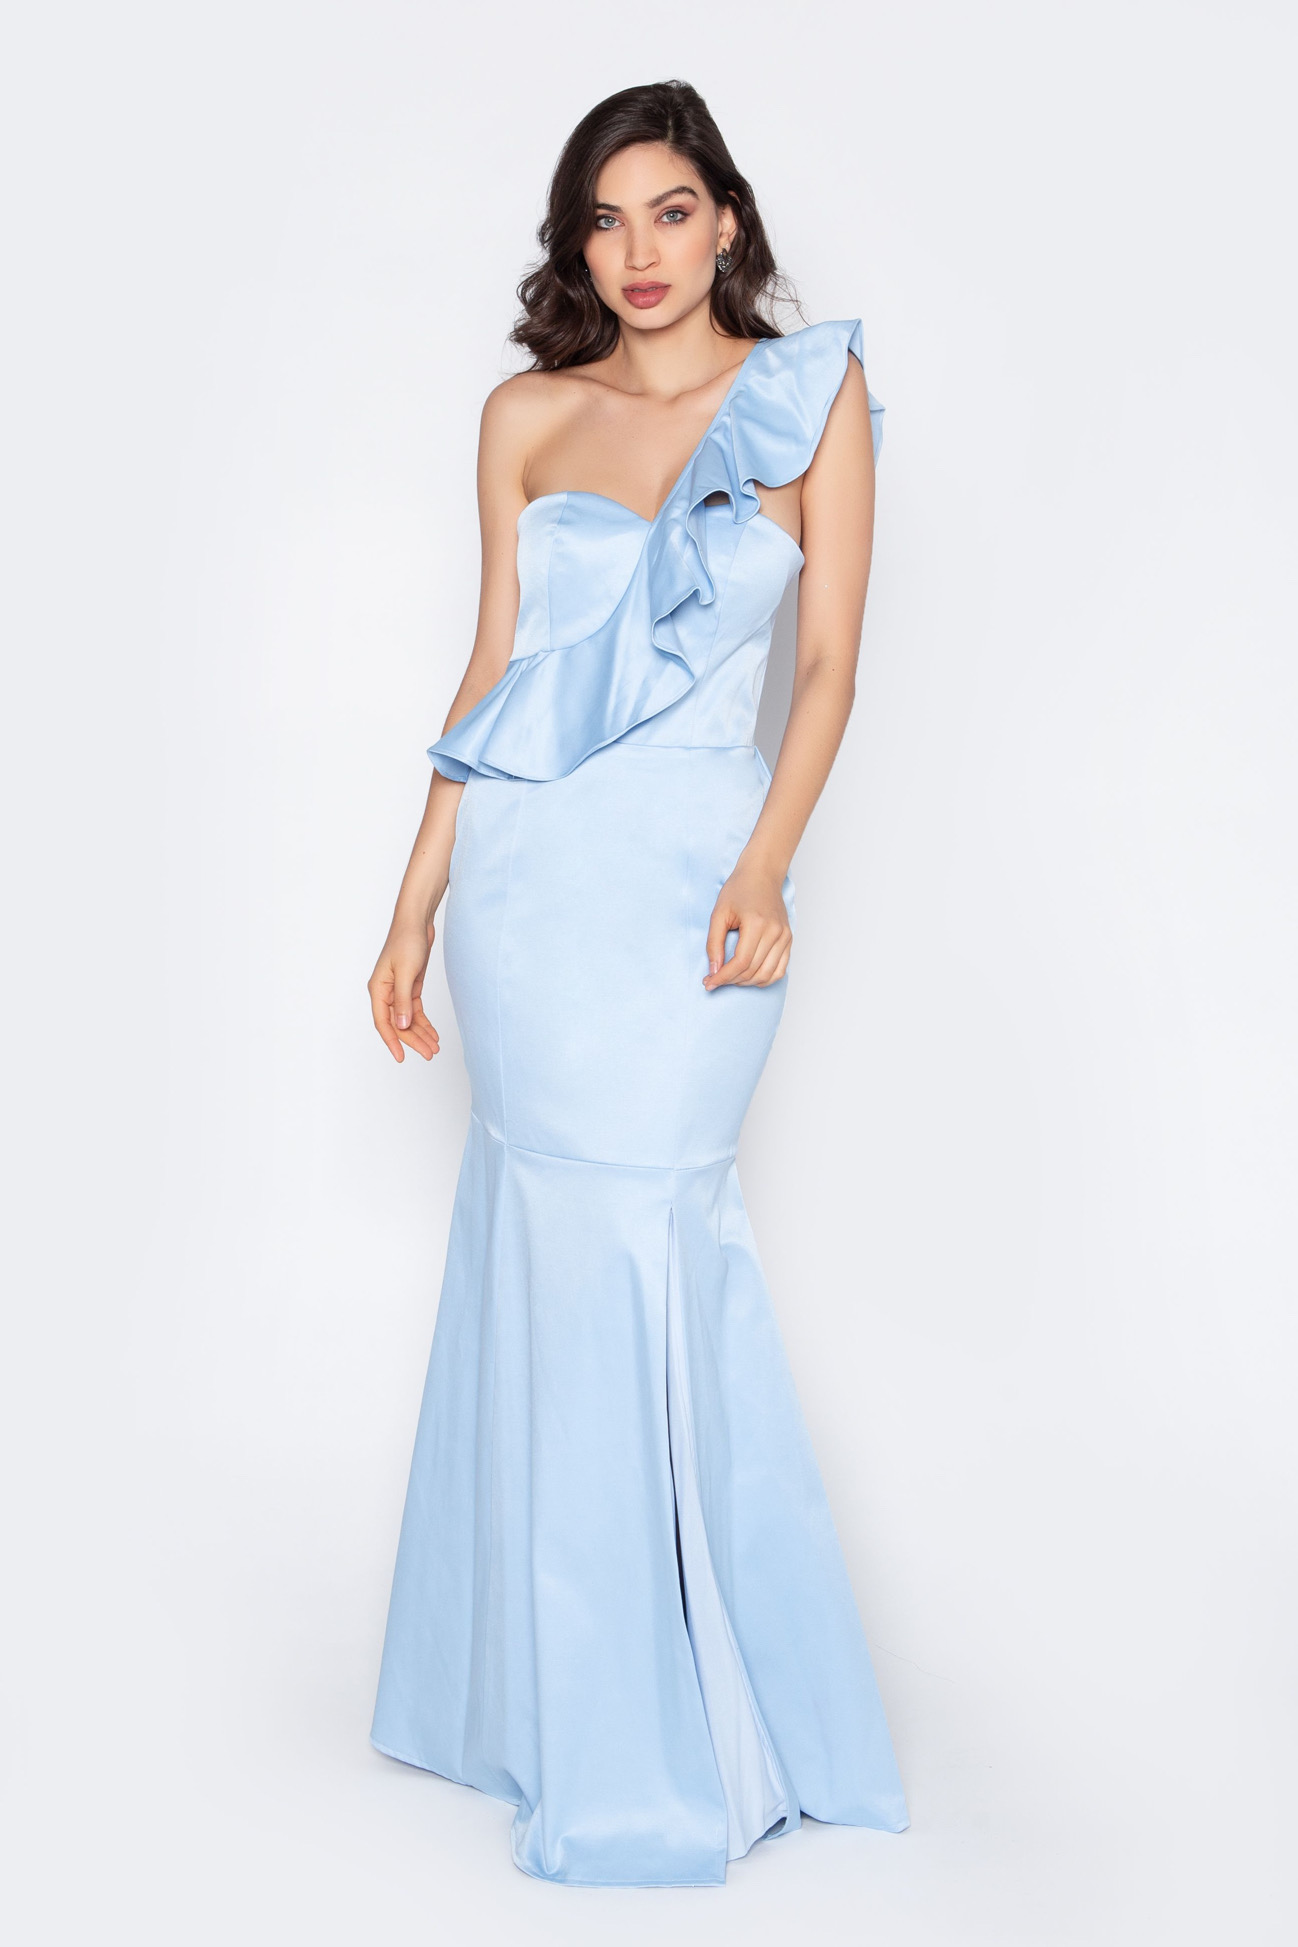 Vestido de festa longo um ombro azul serenity ref.P504